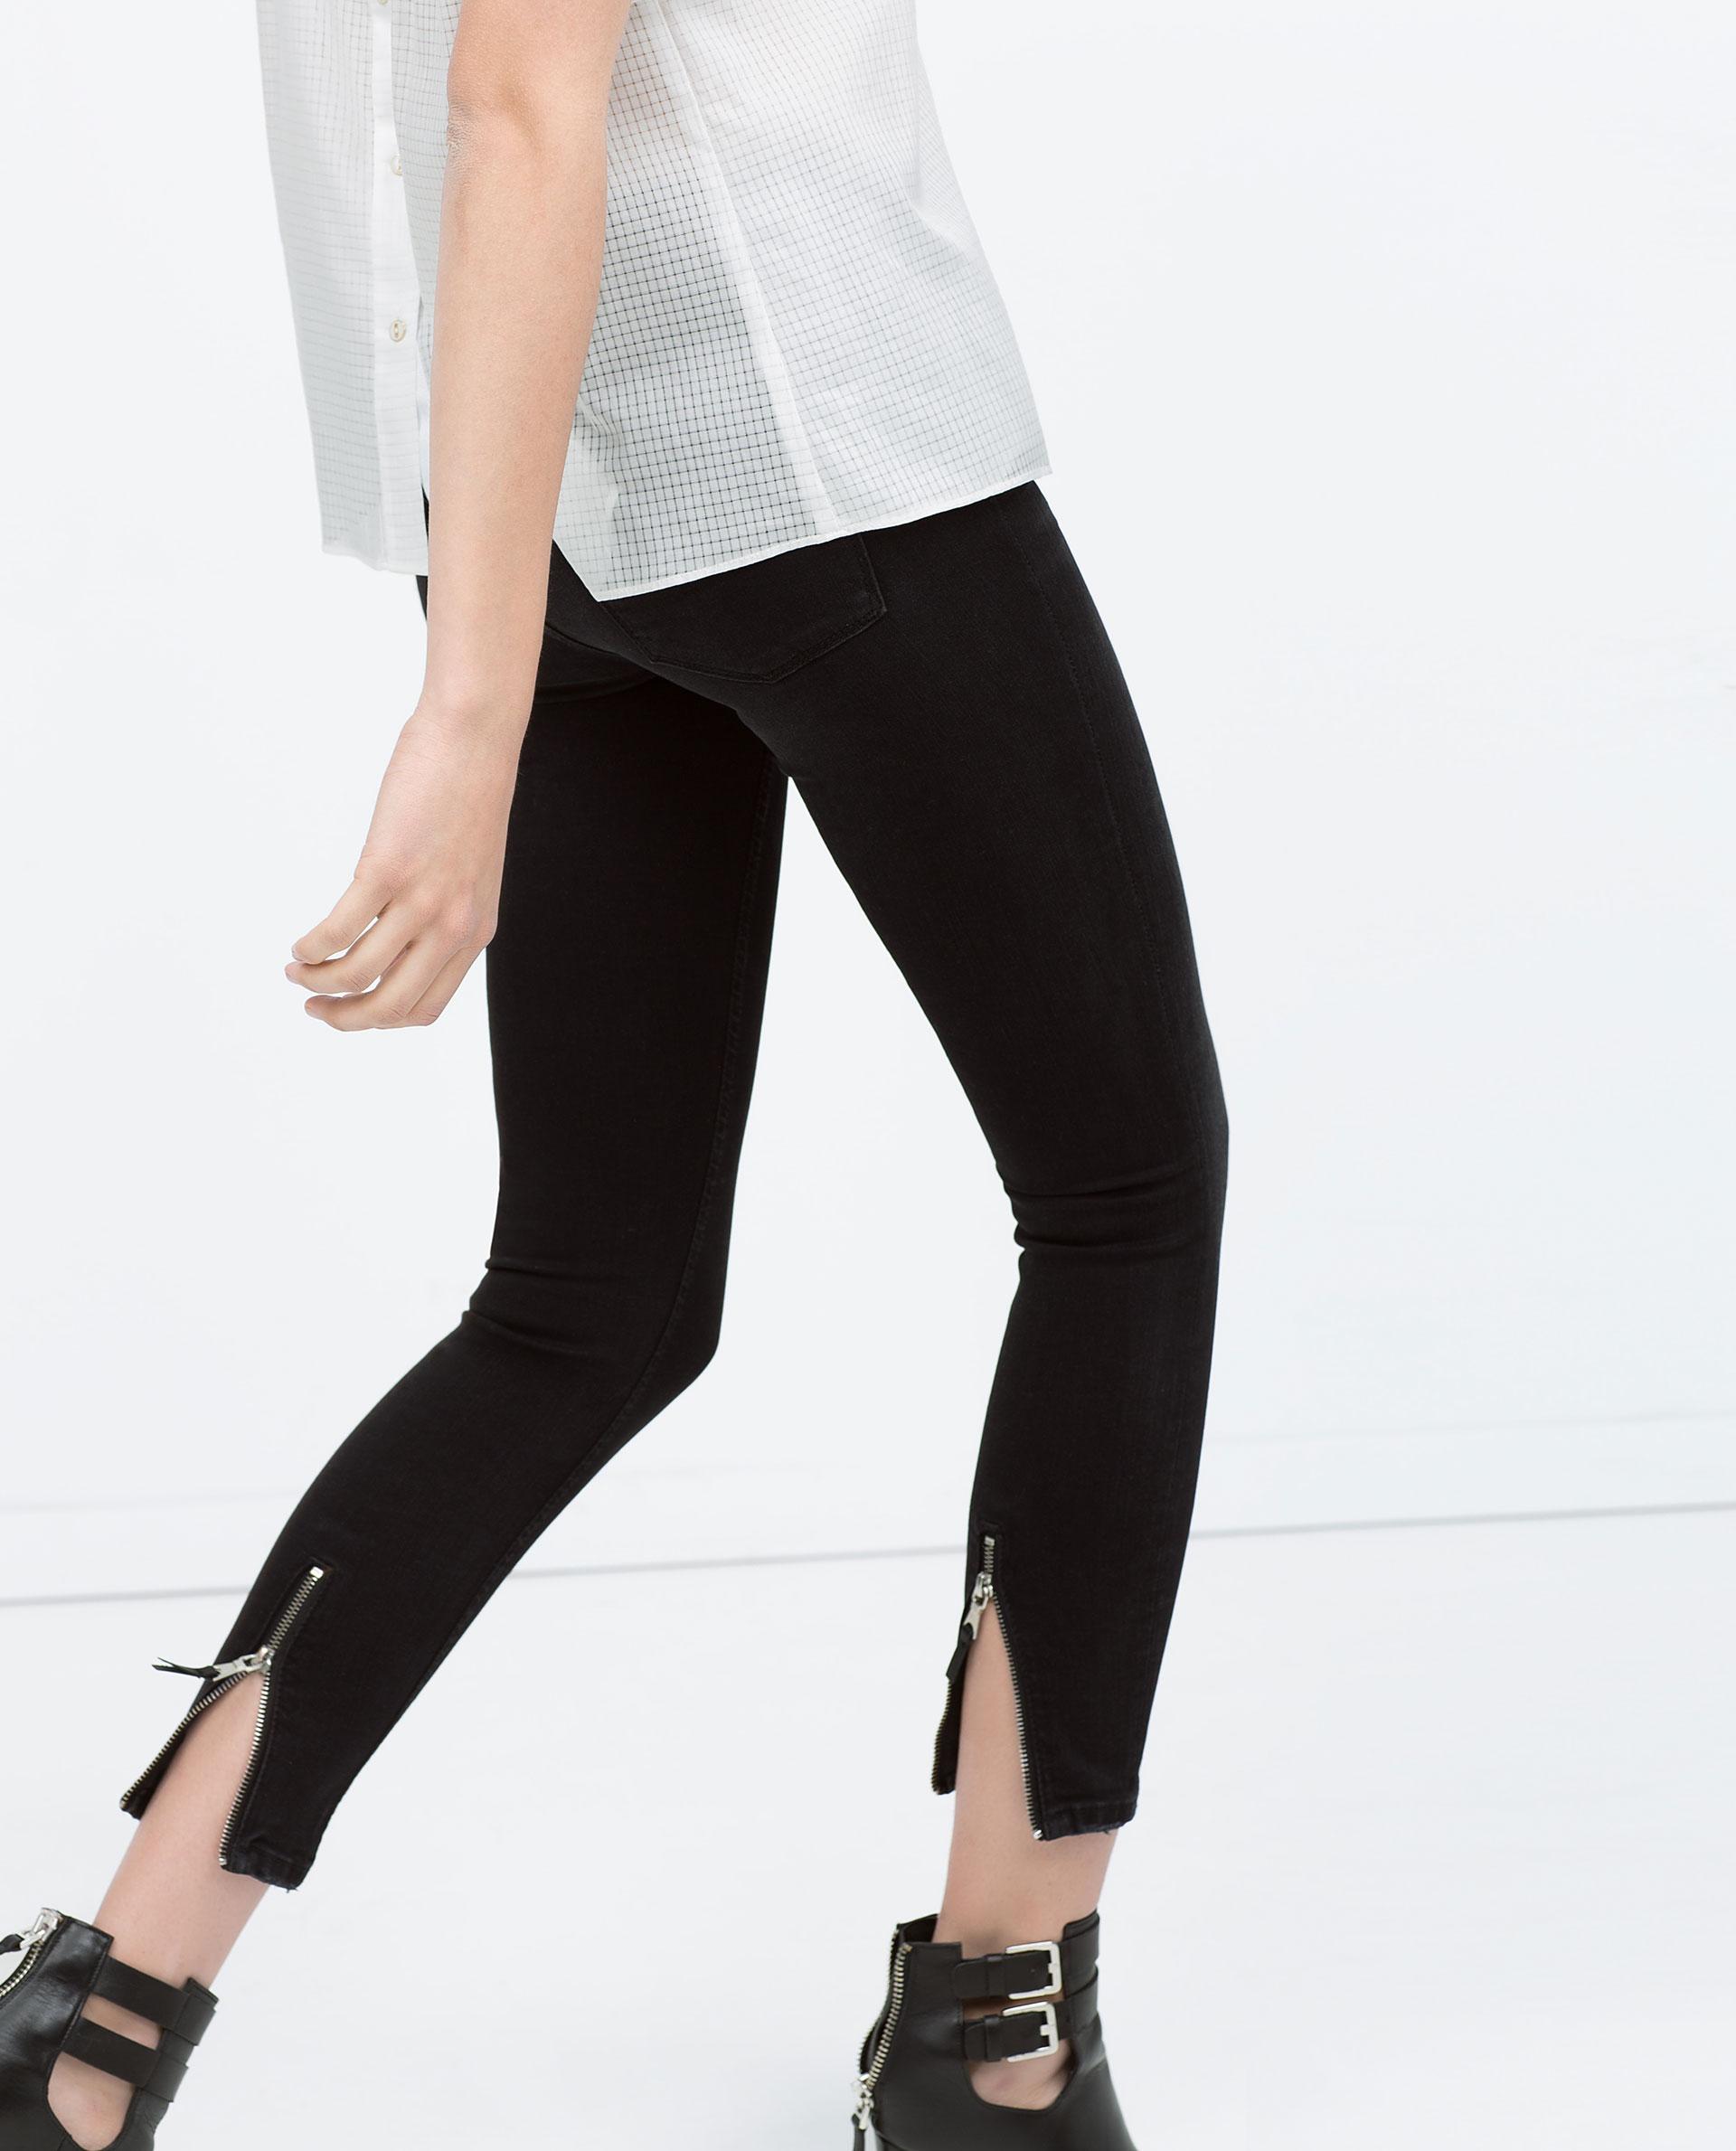 Black Jeans With Zips - Xtellar Jeans